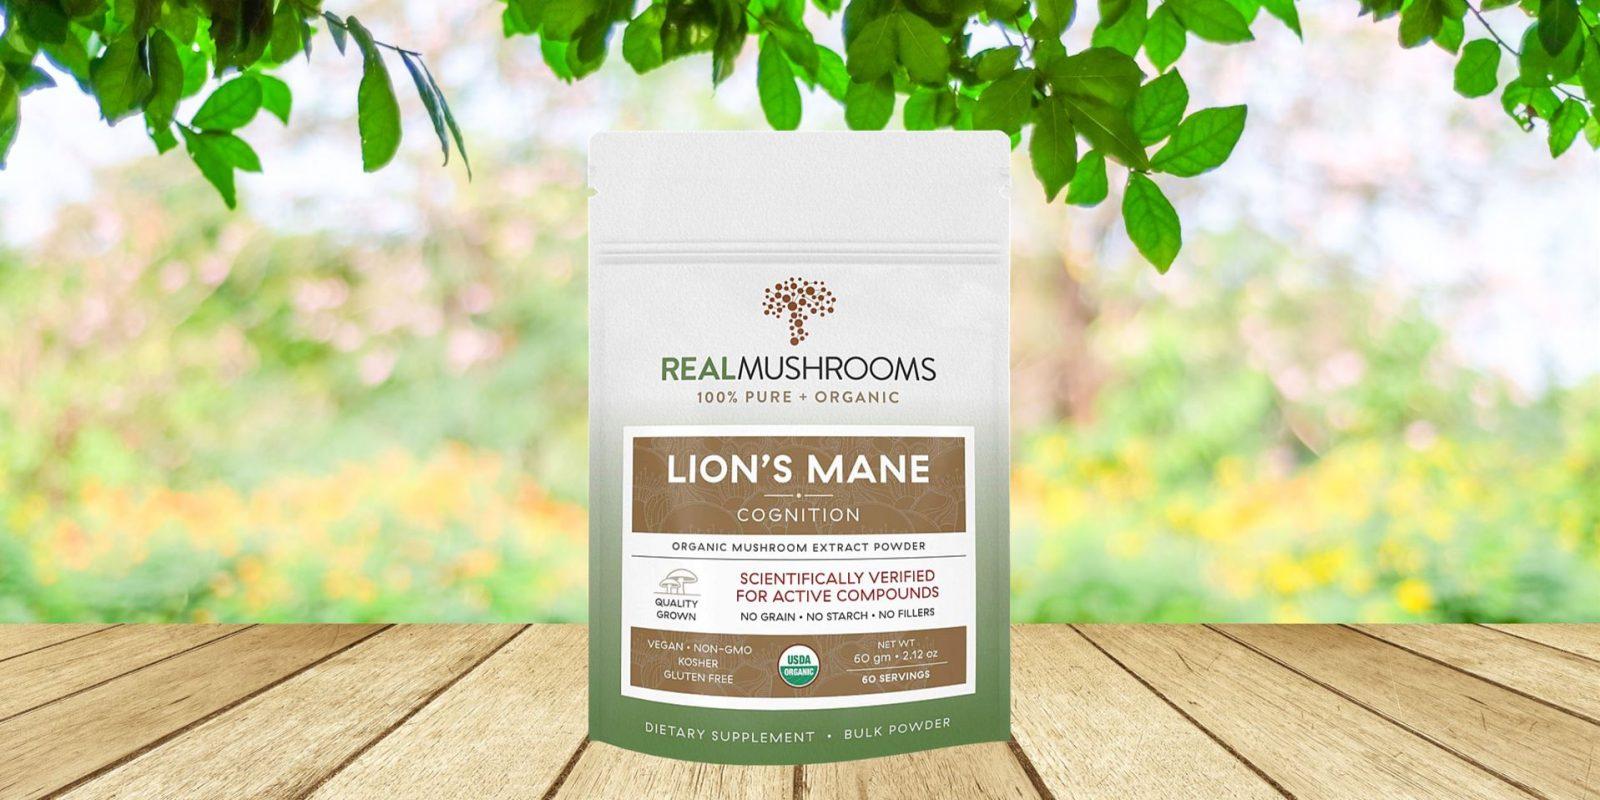 Real Mushrooms Lions Mane Mushroom Extract Powder